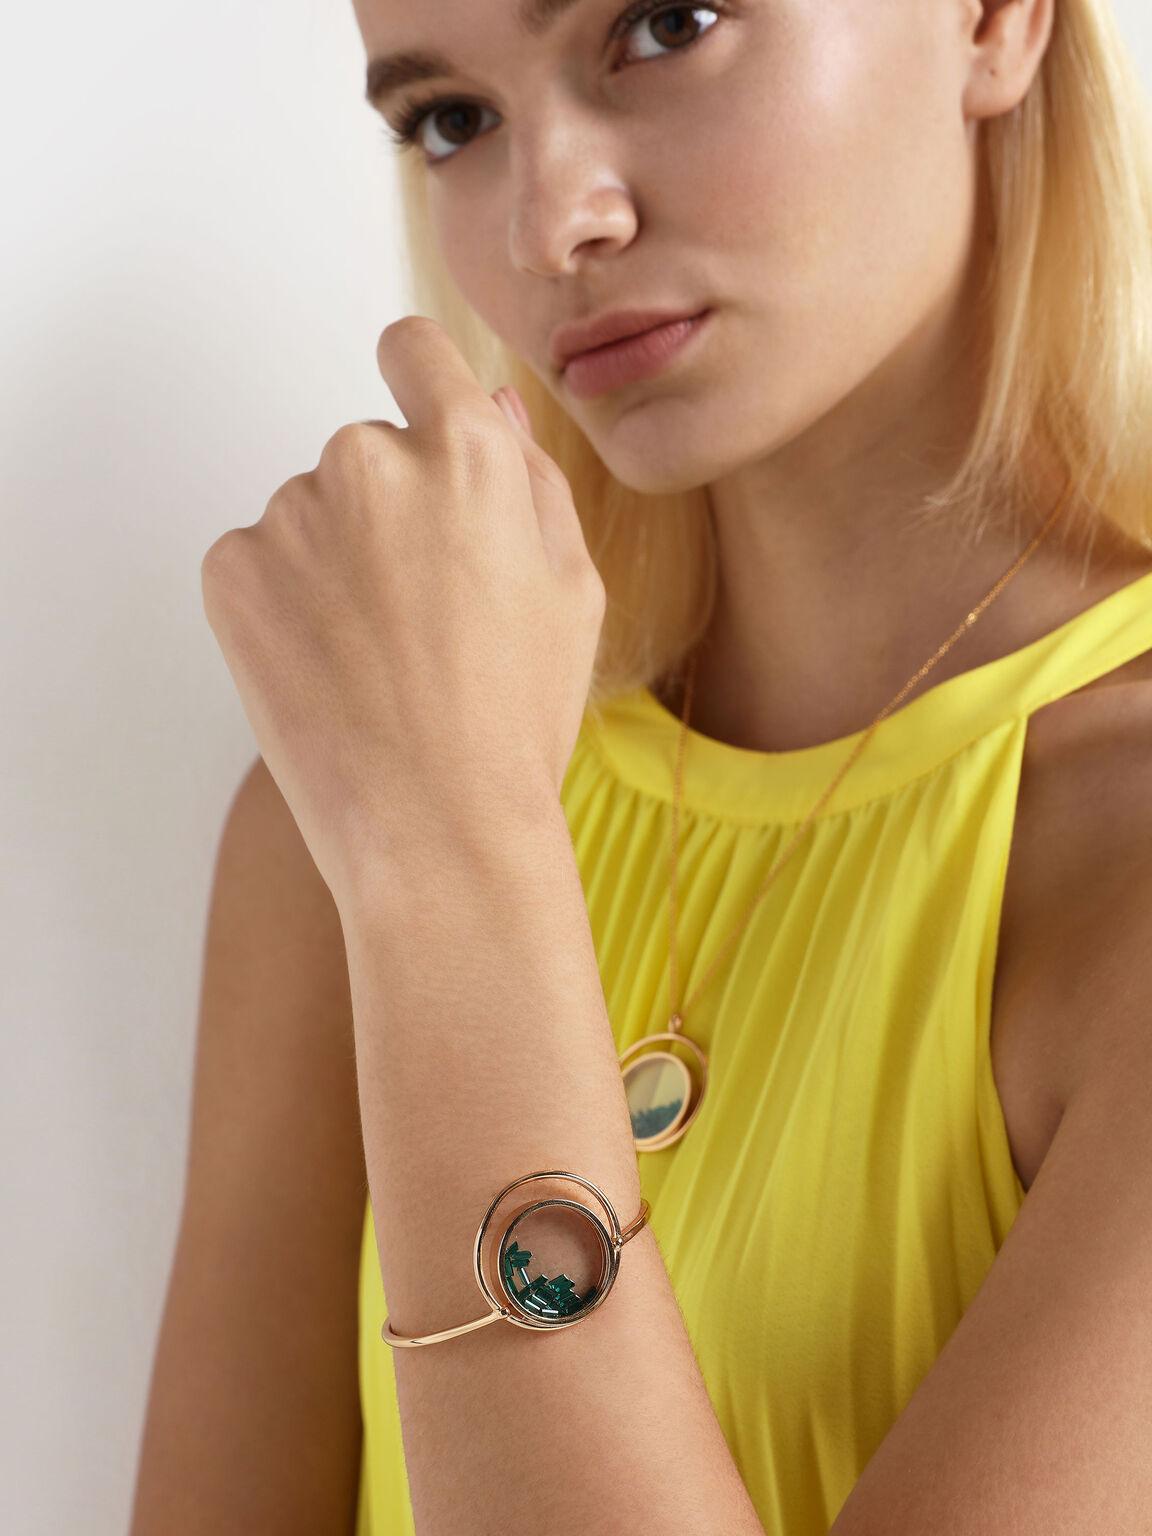 Swarovski® Crystal Emerald Stone Floating Locket Cuff Bracelet, Copper, hi-res